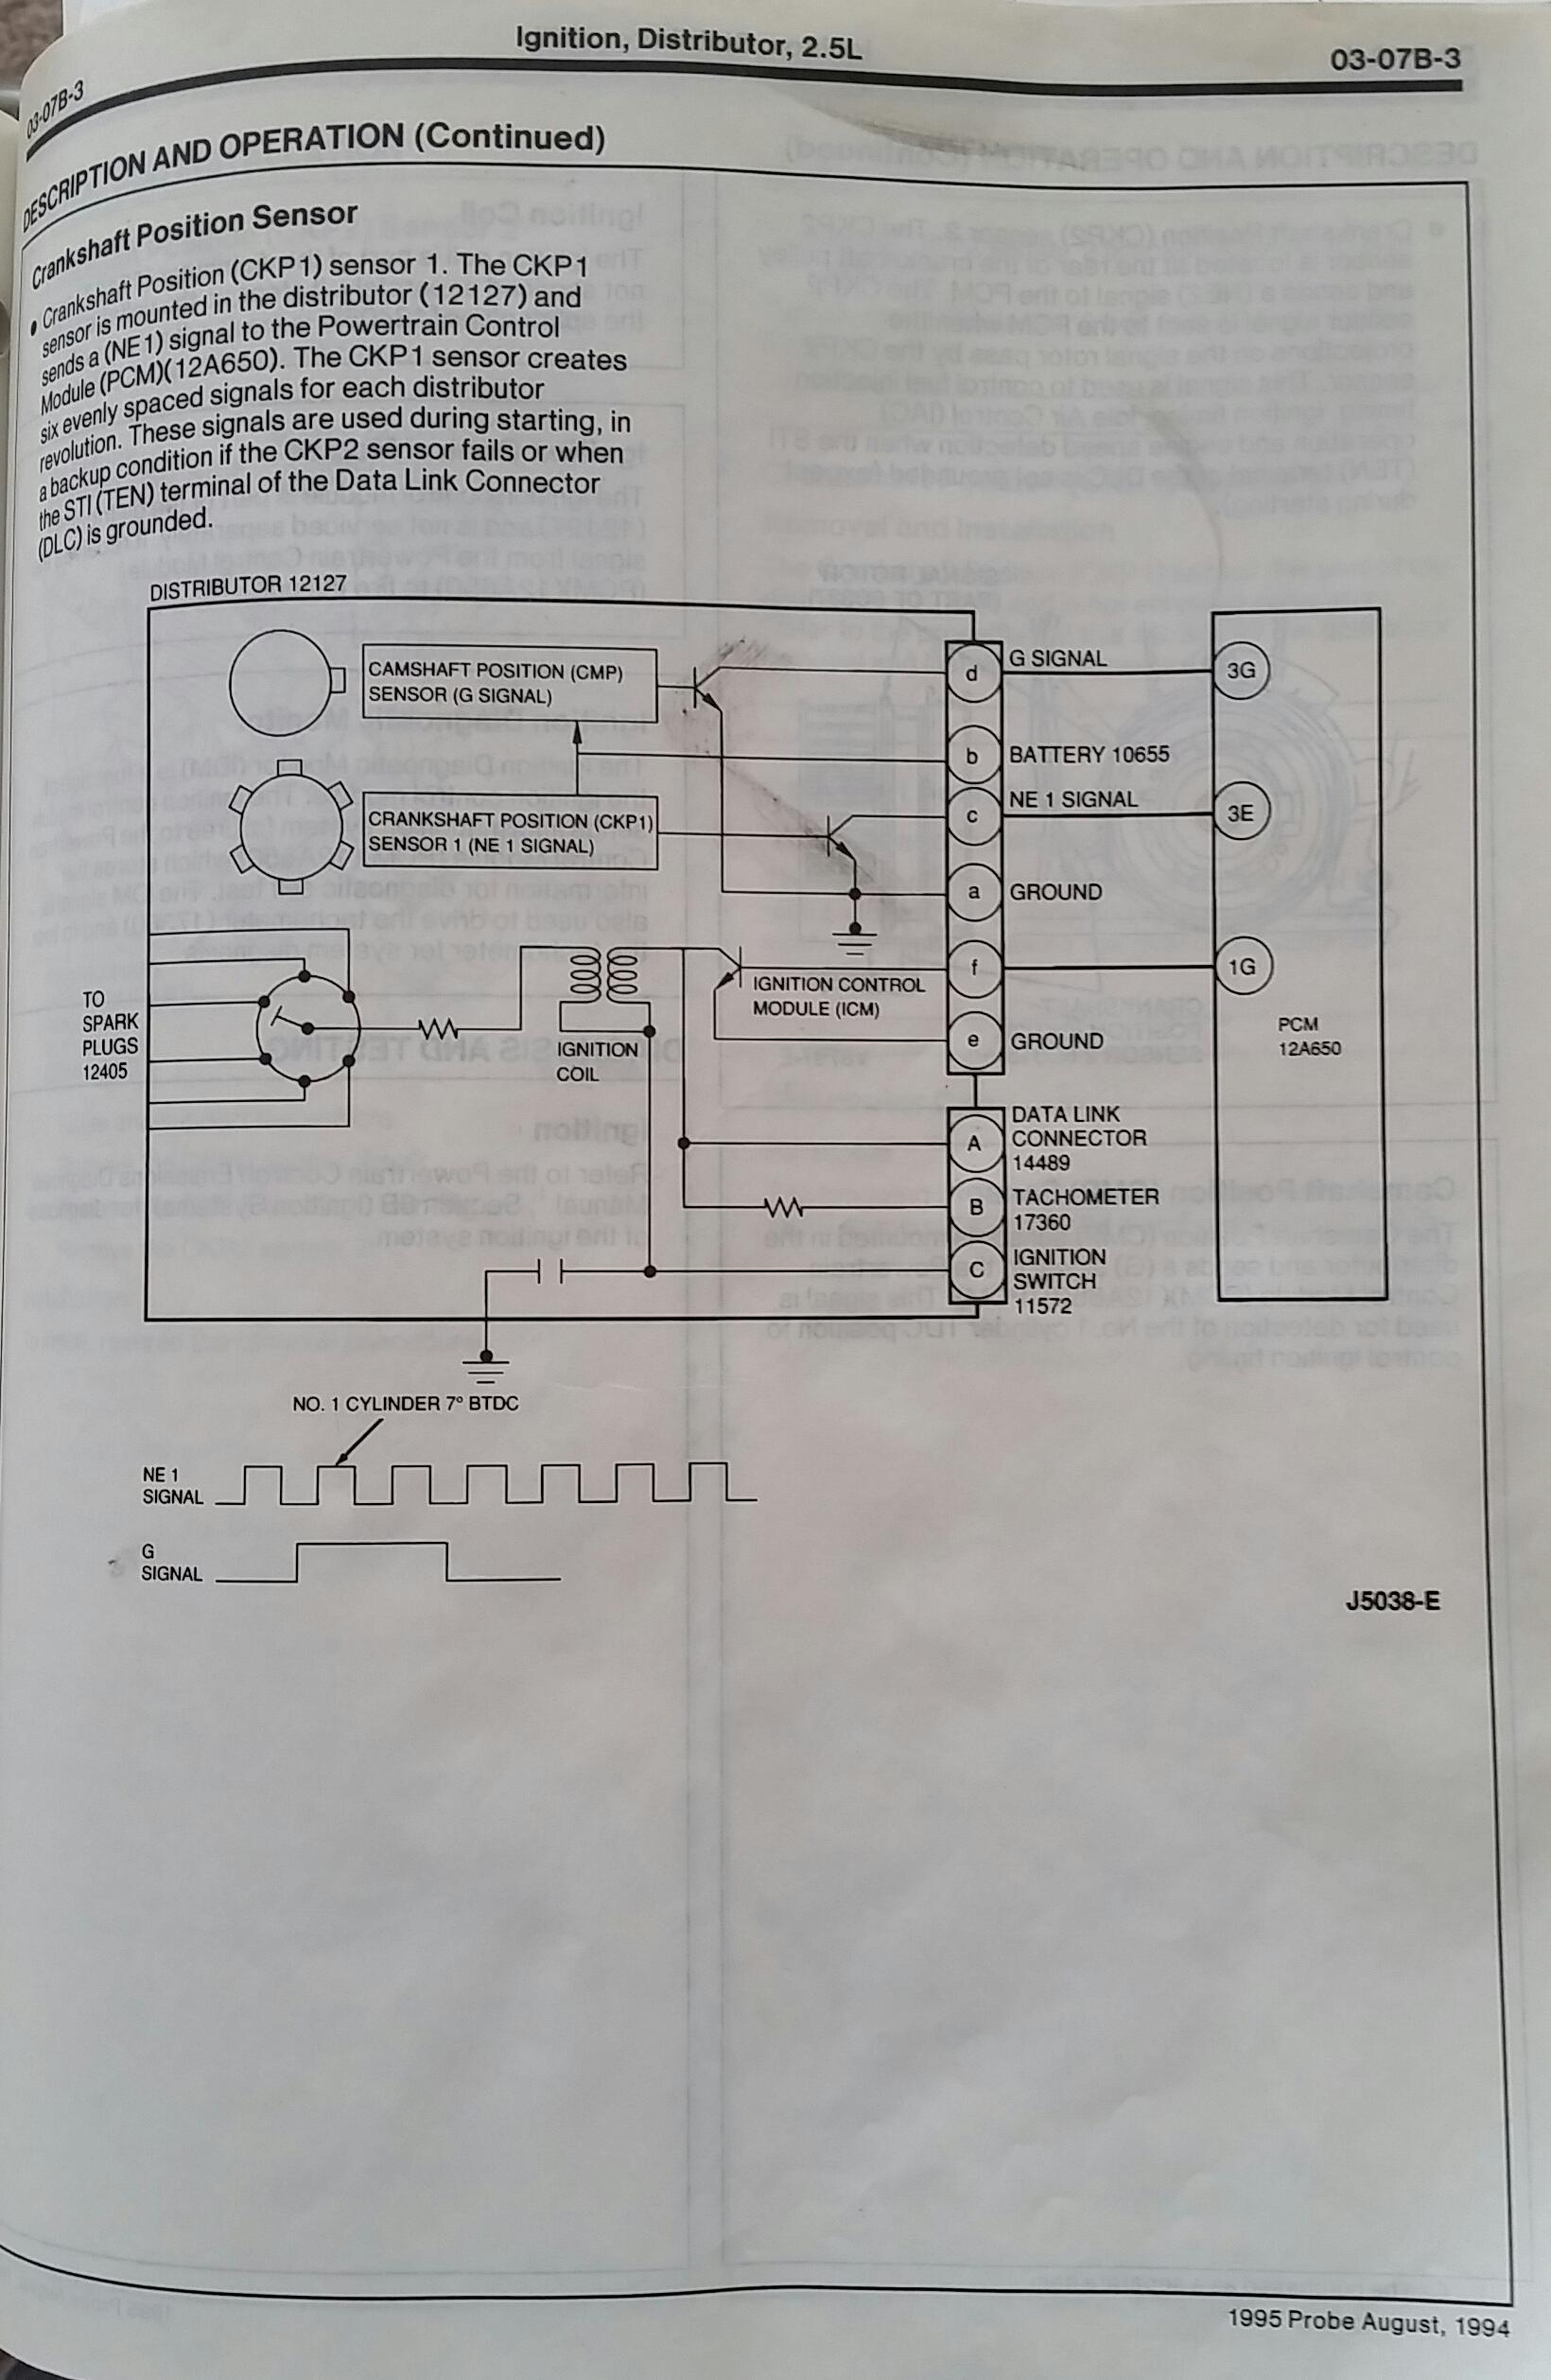 1994 ford probe engine diagram ys 3058  mazda mx6 distributor wiring diagram wiring diagram  mazda mx6 distributor wiring diagram